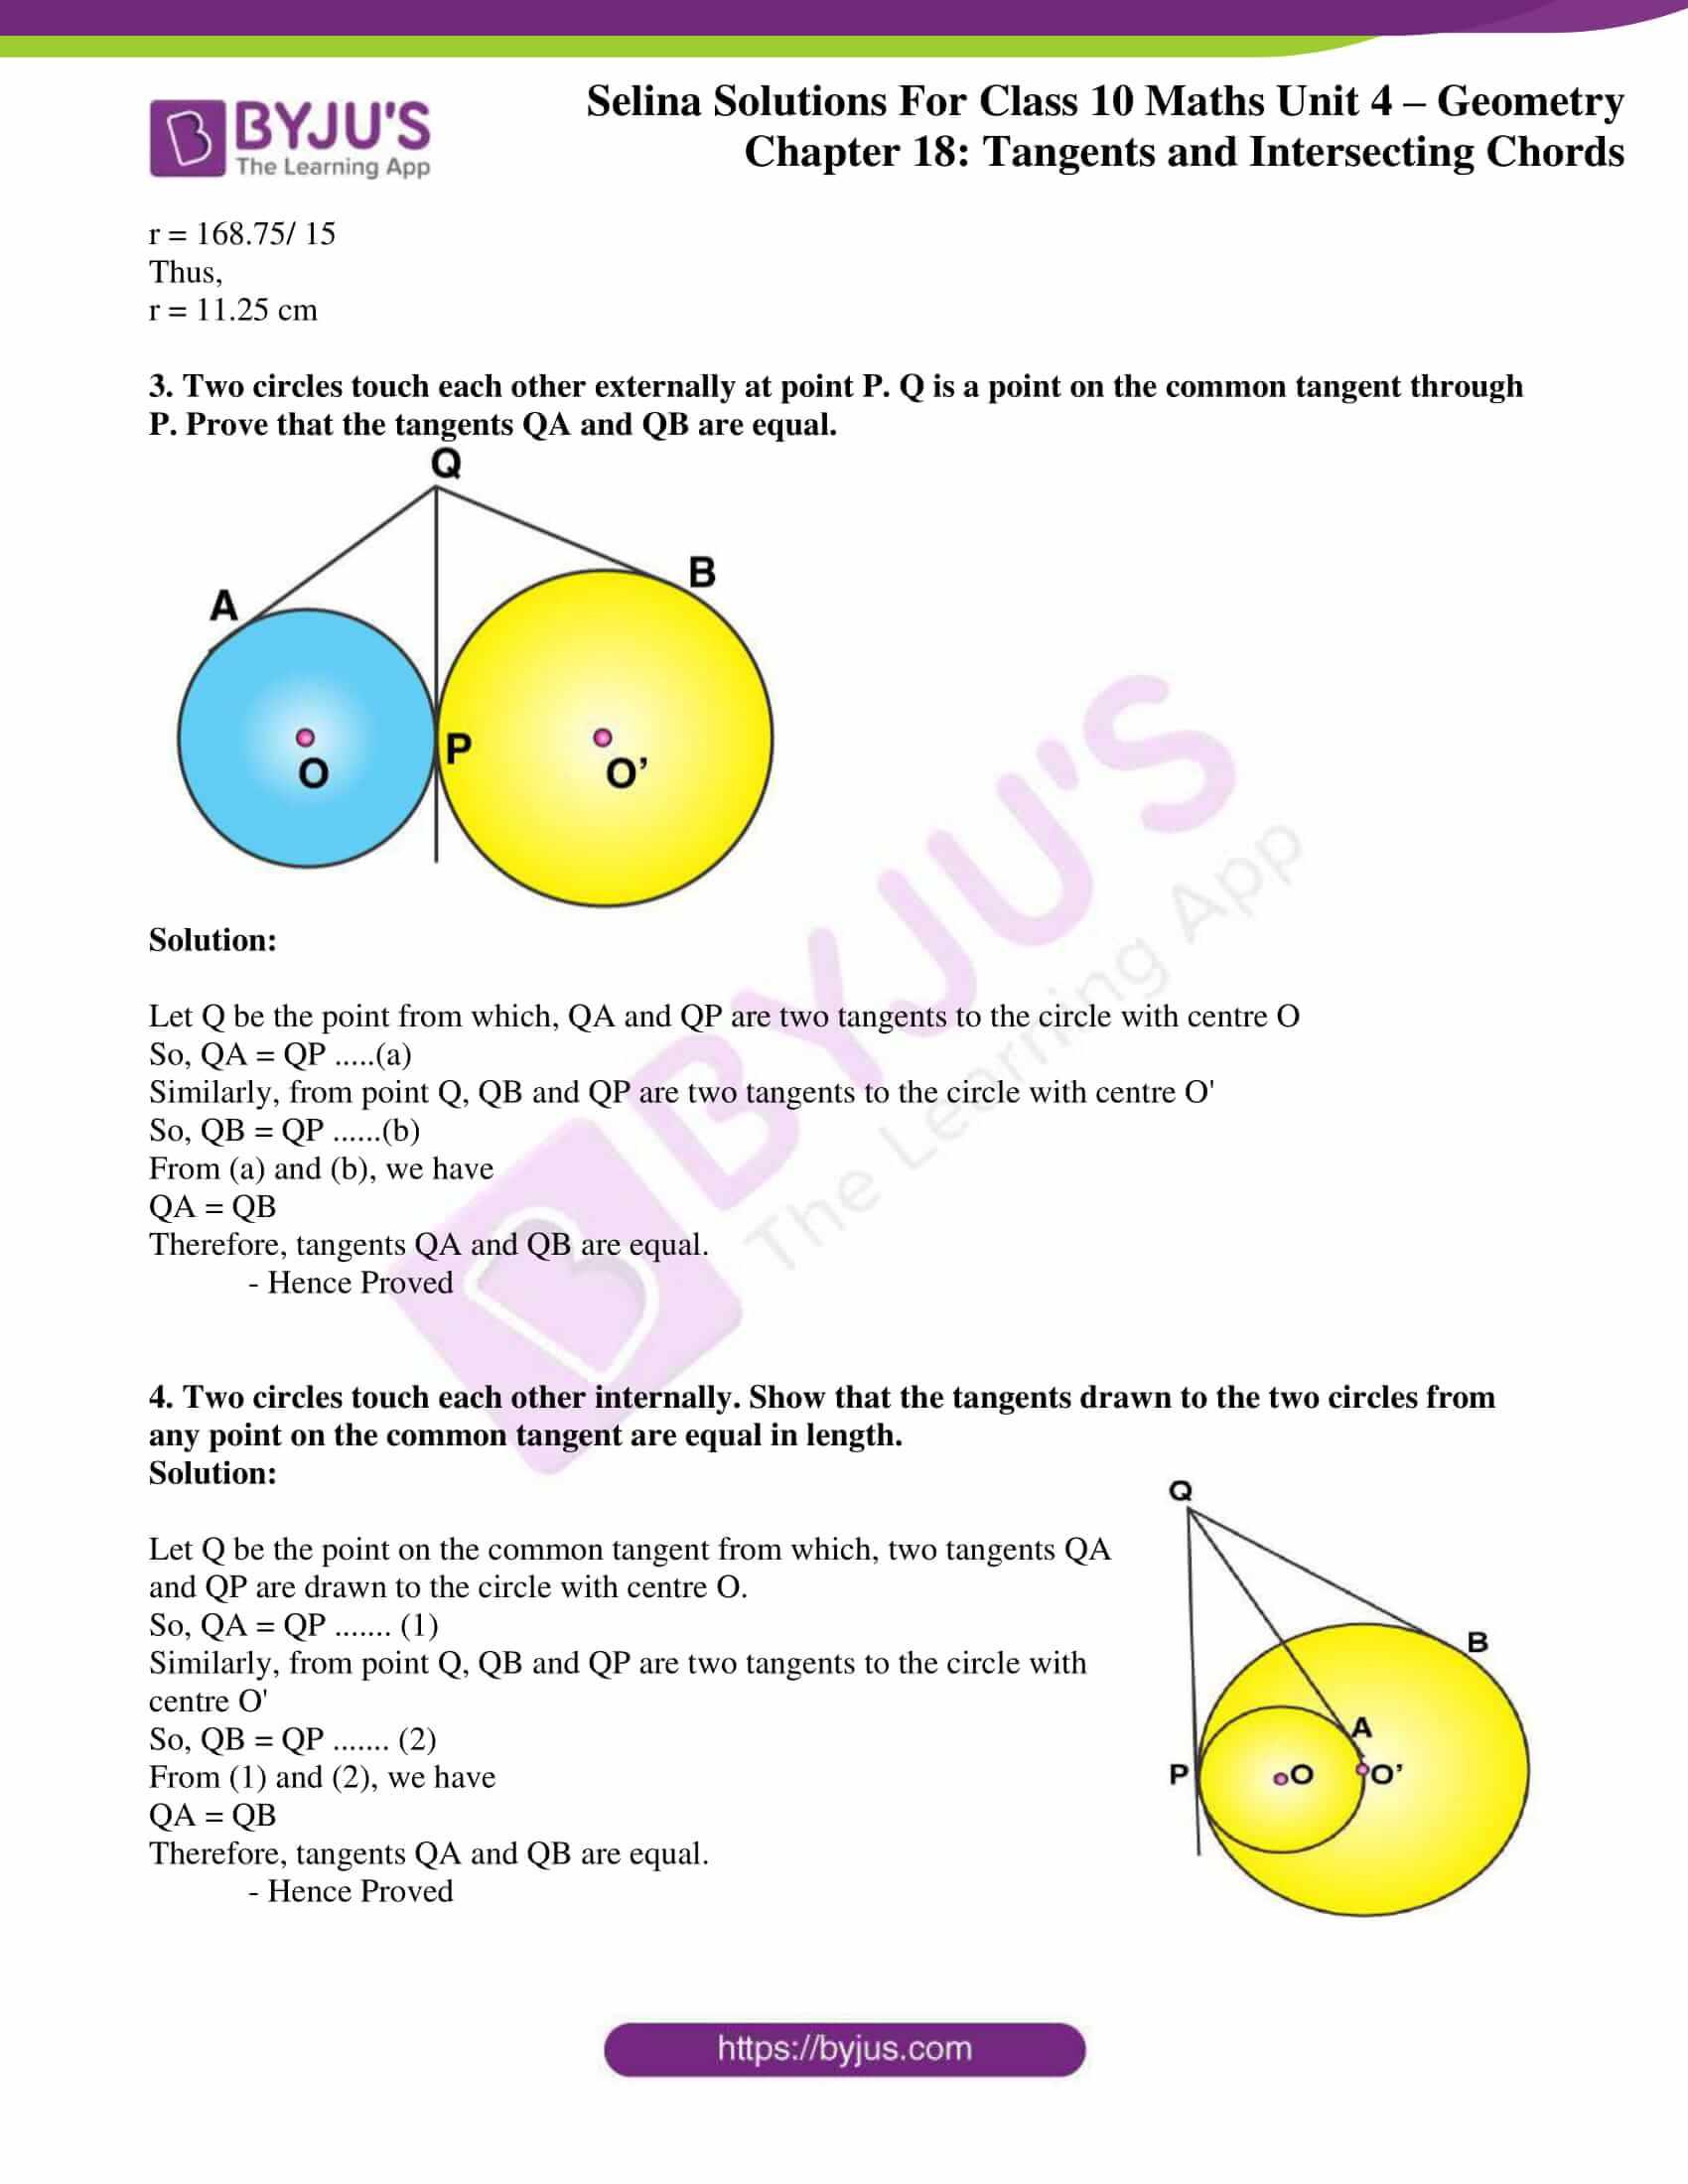 selina-sol-maths-class-10-ch-18-ex-a-2